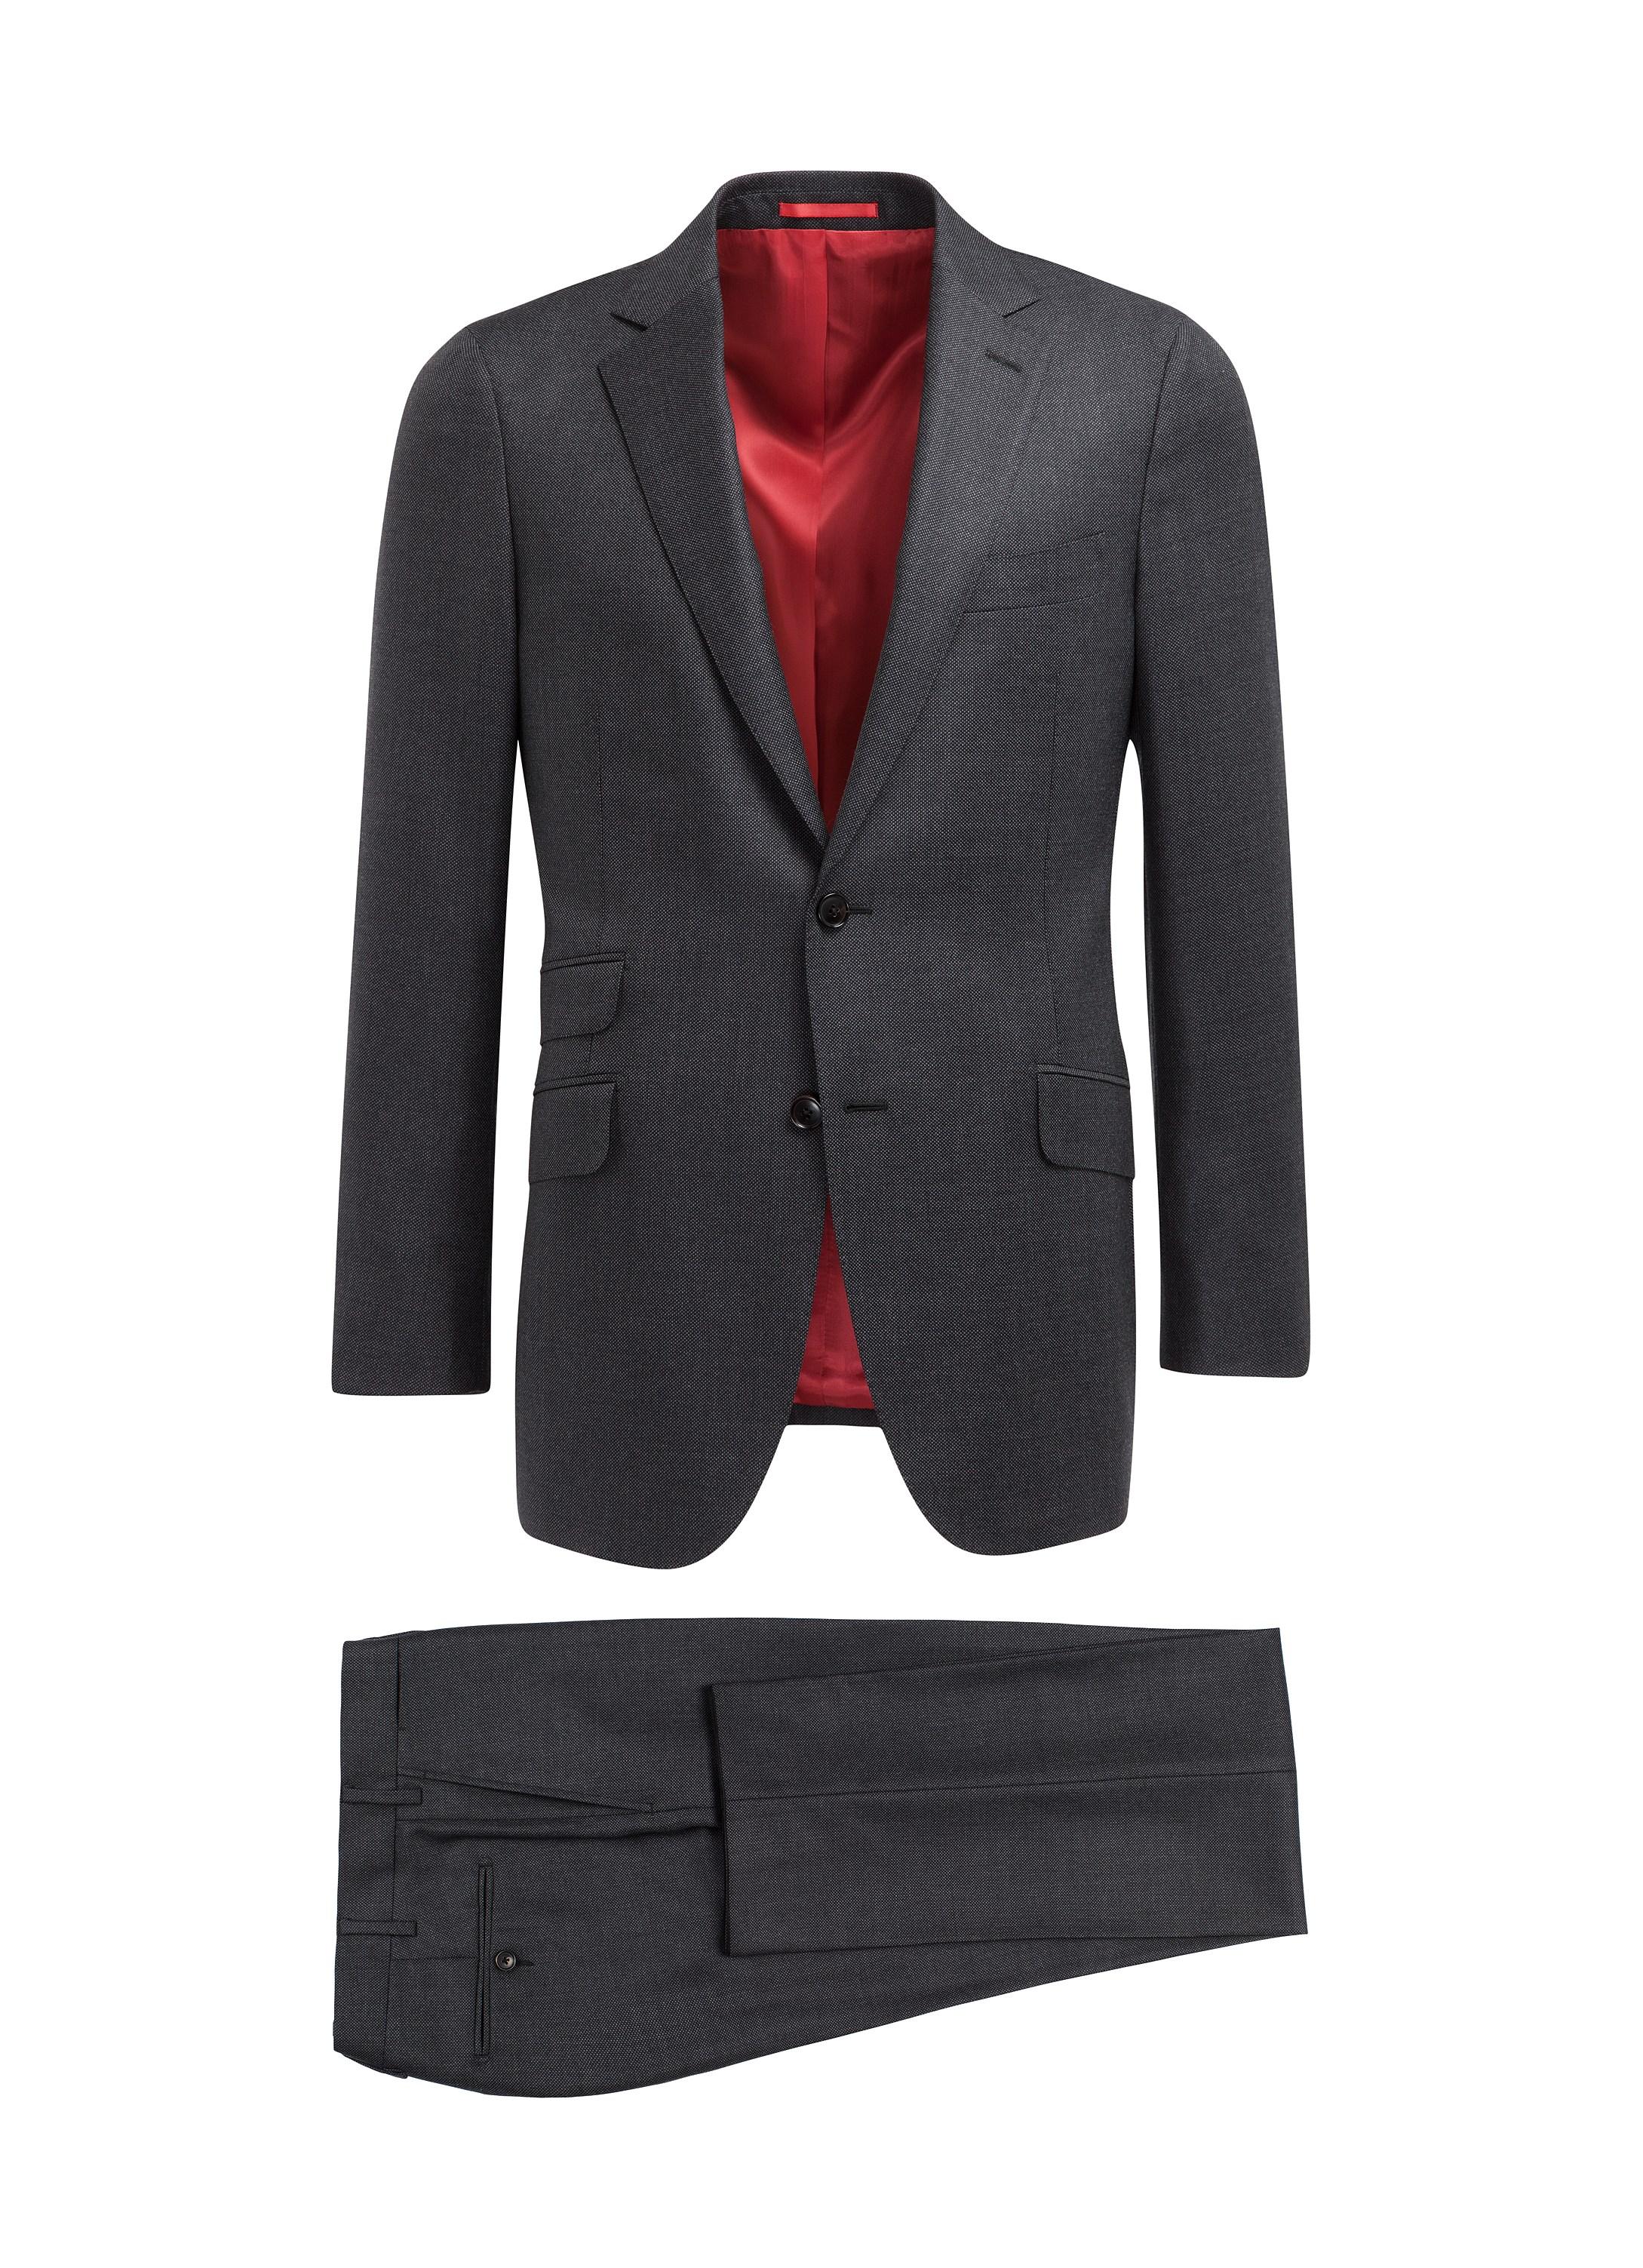 Suits_Grey_Birds_Eye_Sienna_P2444_Suitsupply_Online_Store_5.jpg